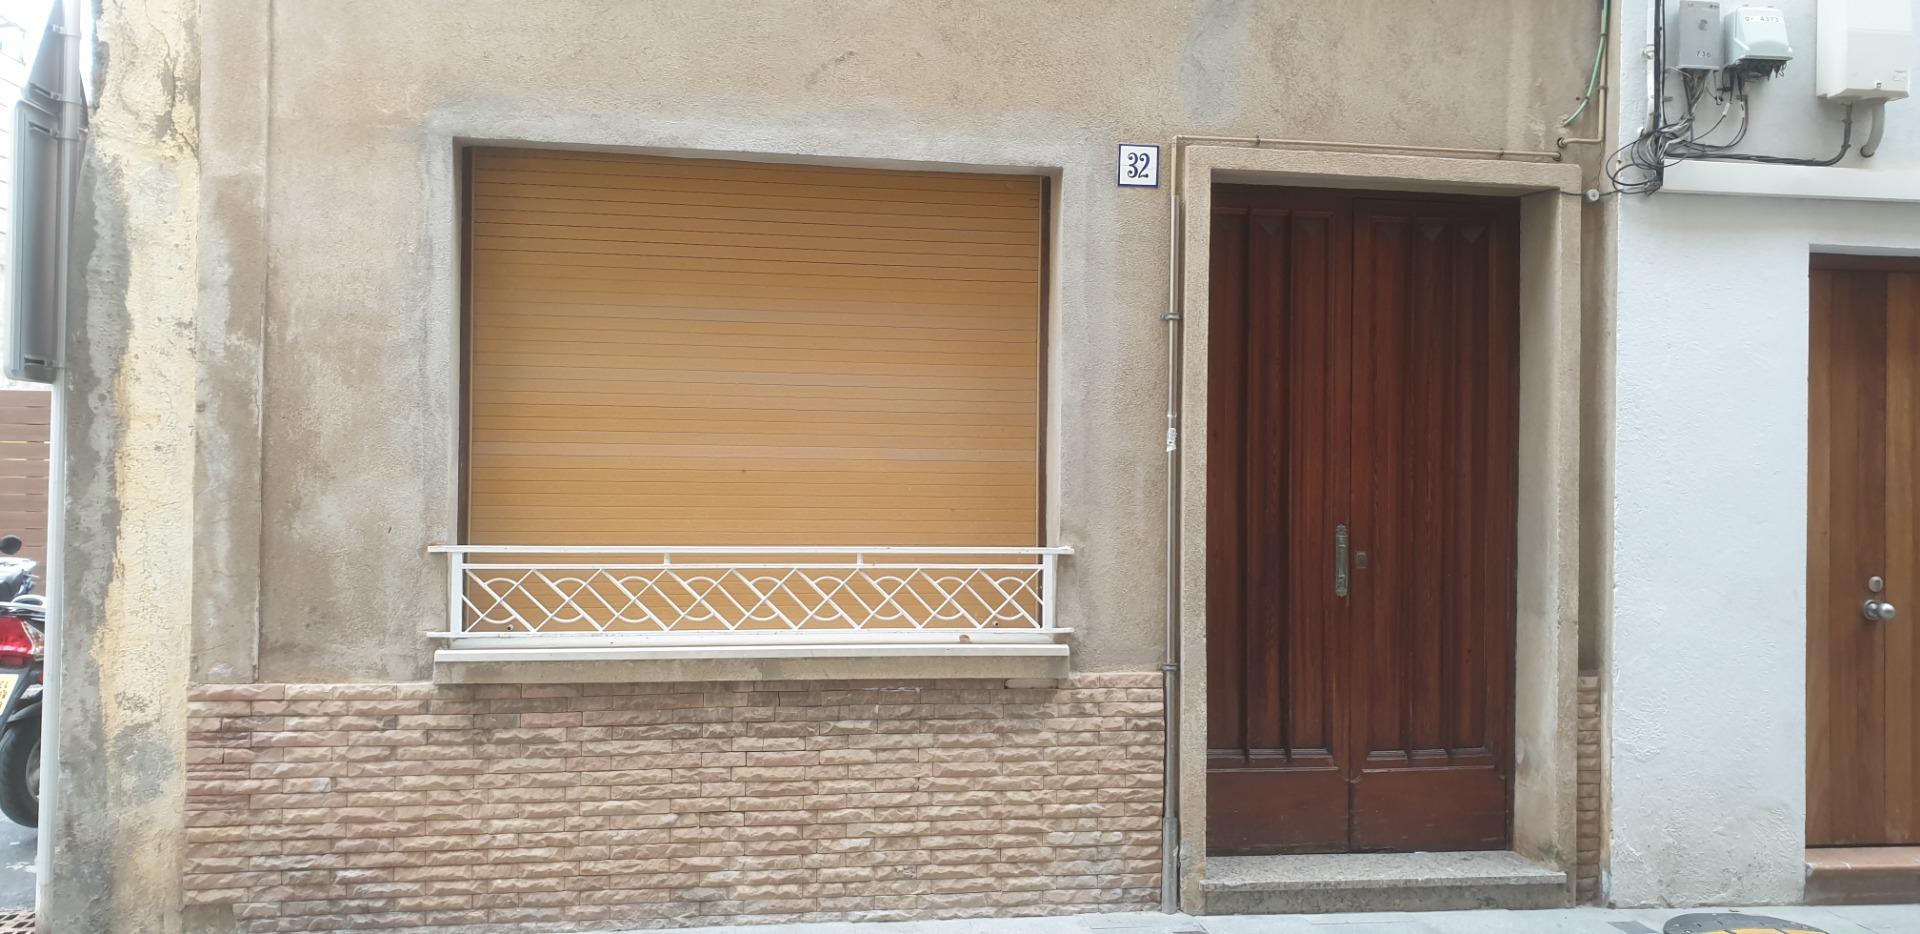 Affitto Casa  Carrer francesc bartrina